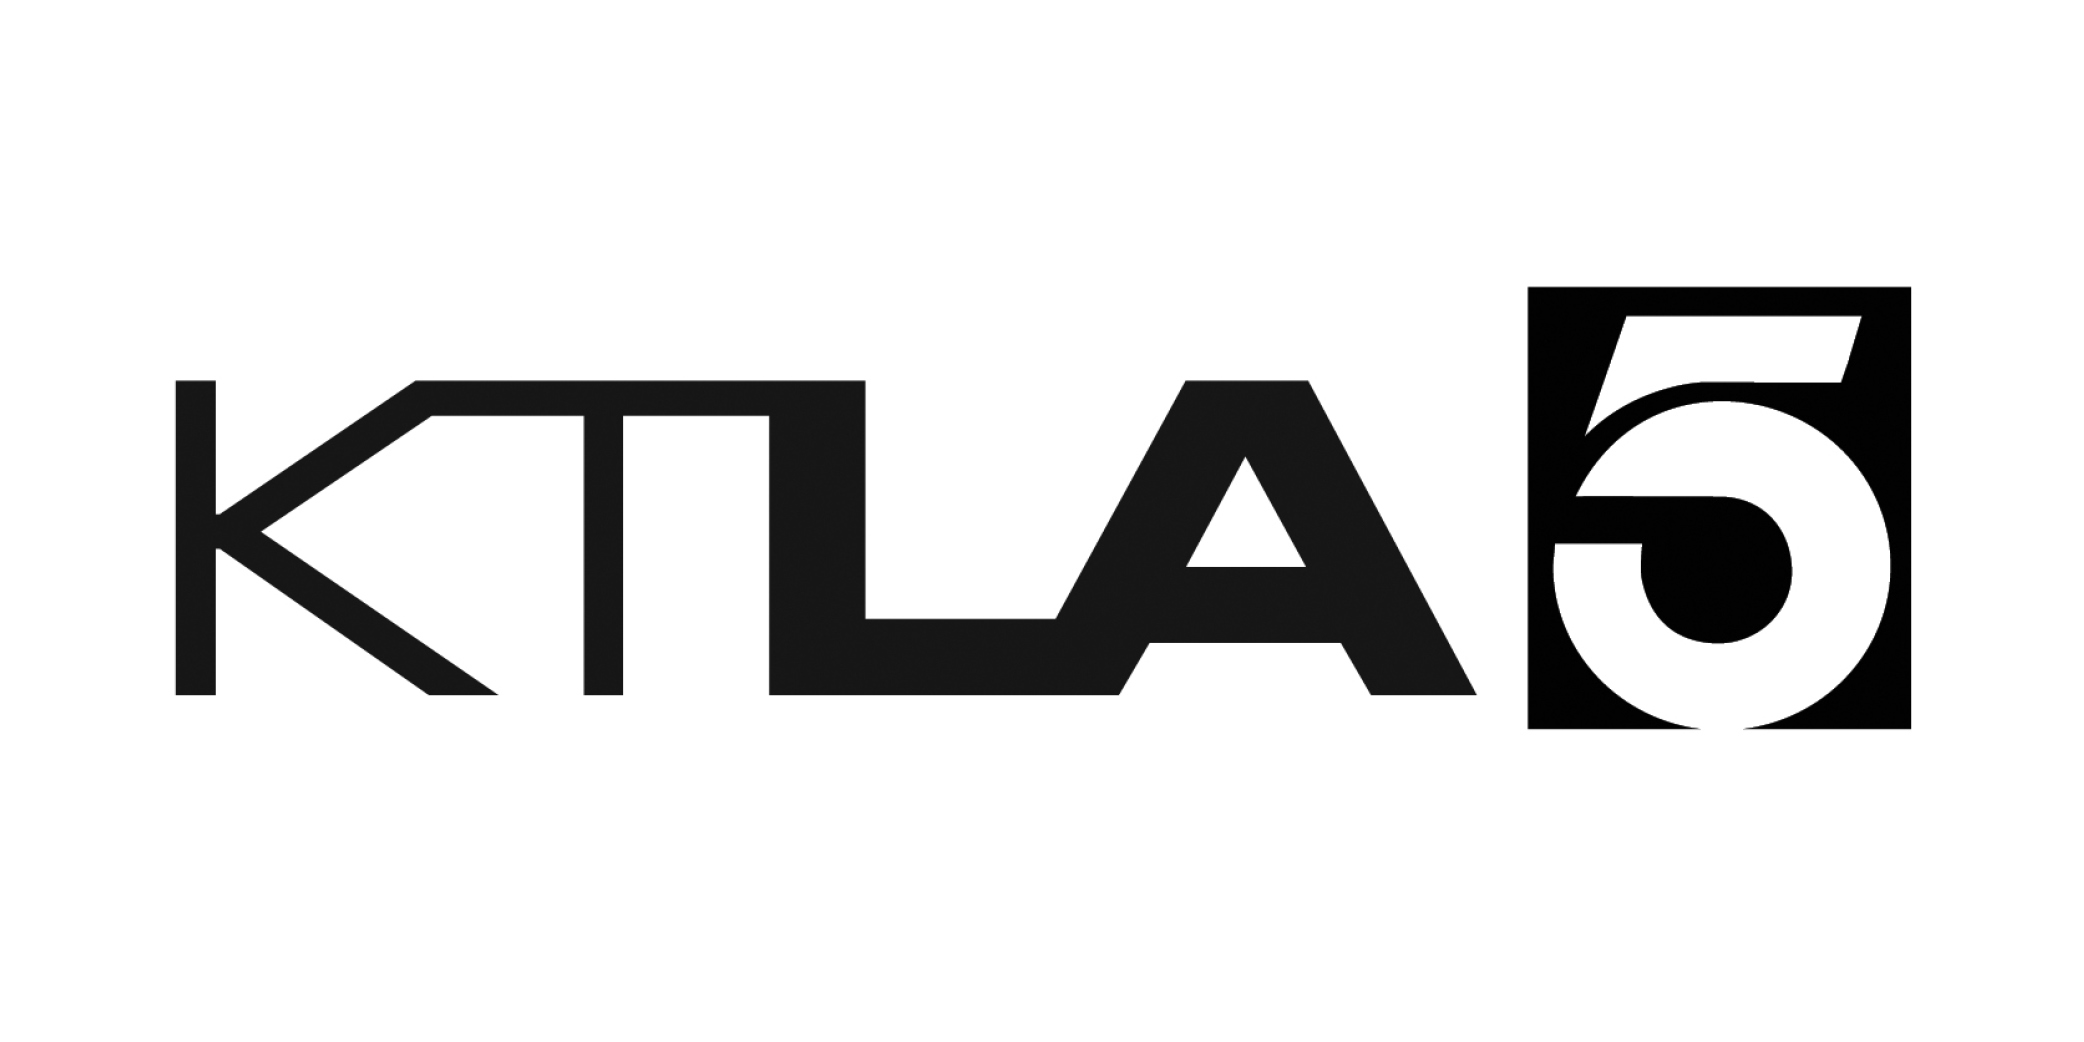 KTLA_C